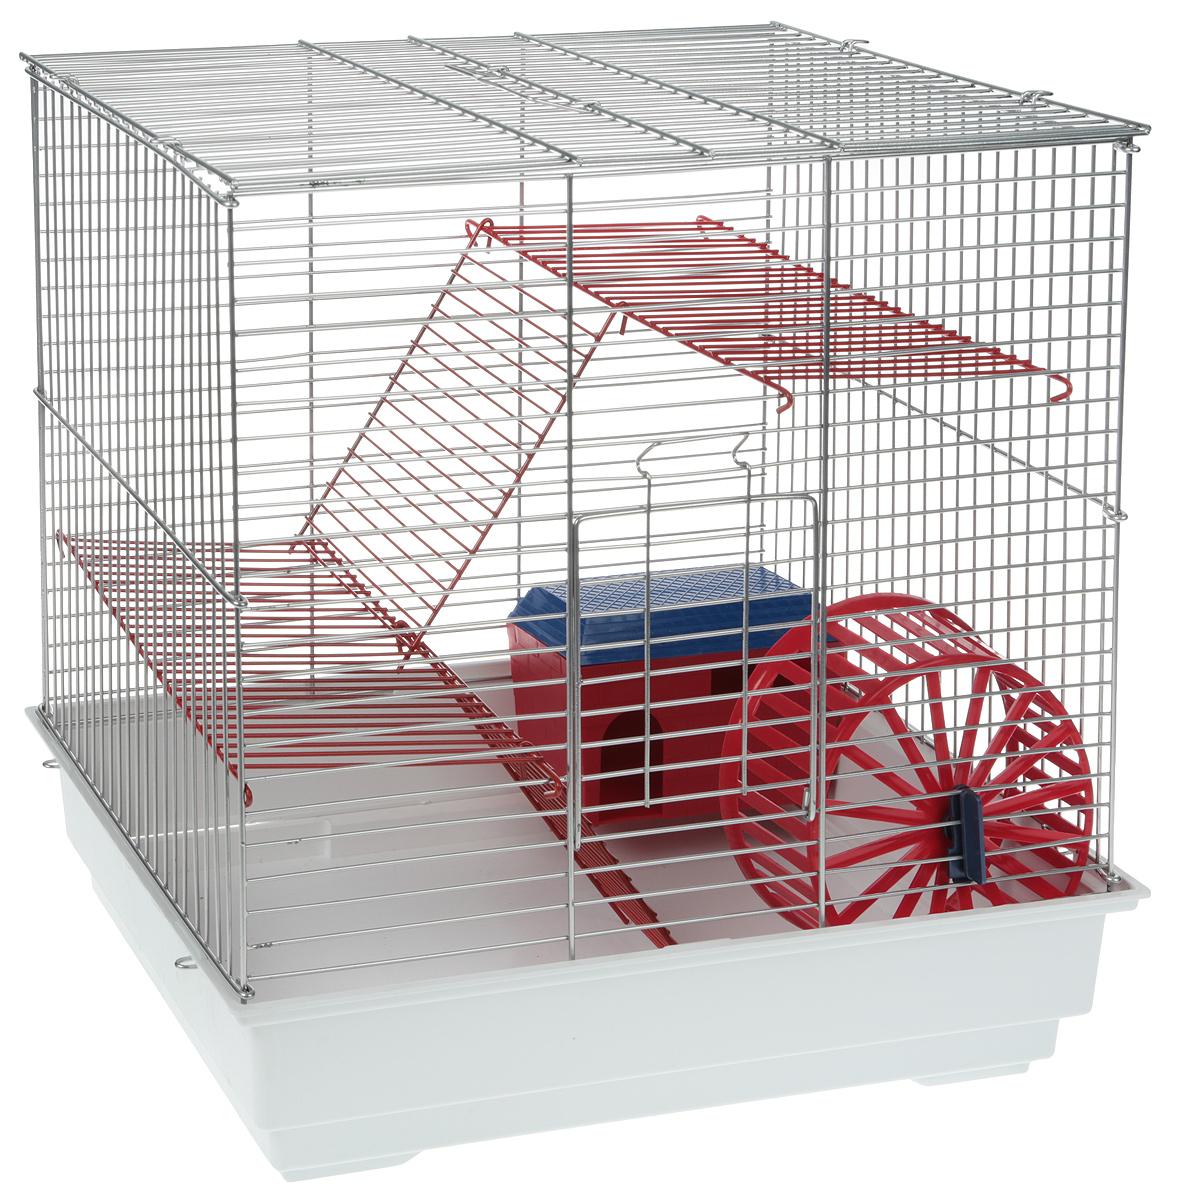 Клетка для грызунов Велес Lusy 3, 3-этажная, разборная, цвет: белый, серебристый, 30 х 40 х 43 см клетка для грызунов велес lusy hamster 2 2 этажная цвет синий бирюзовый 35 х 26 х 26 см